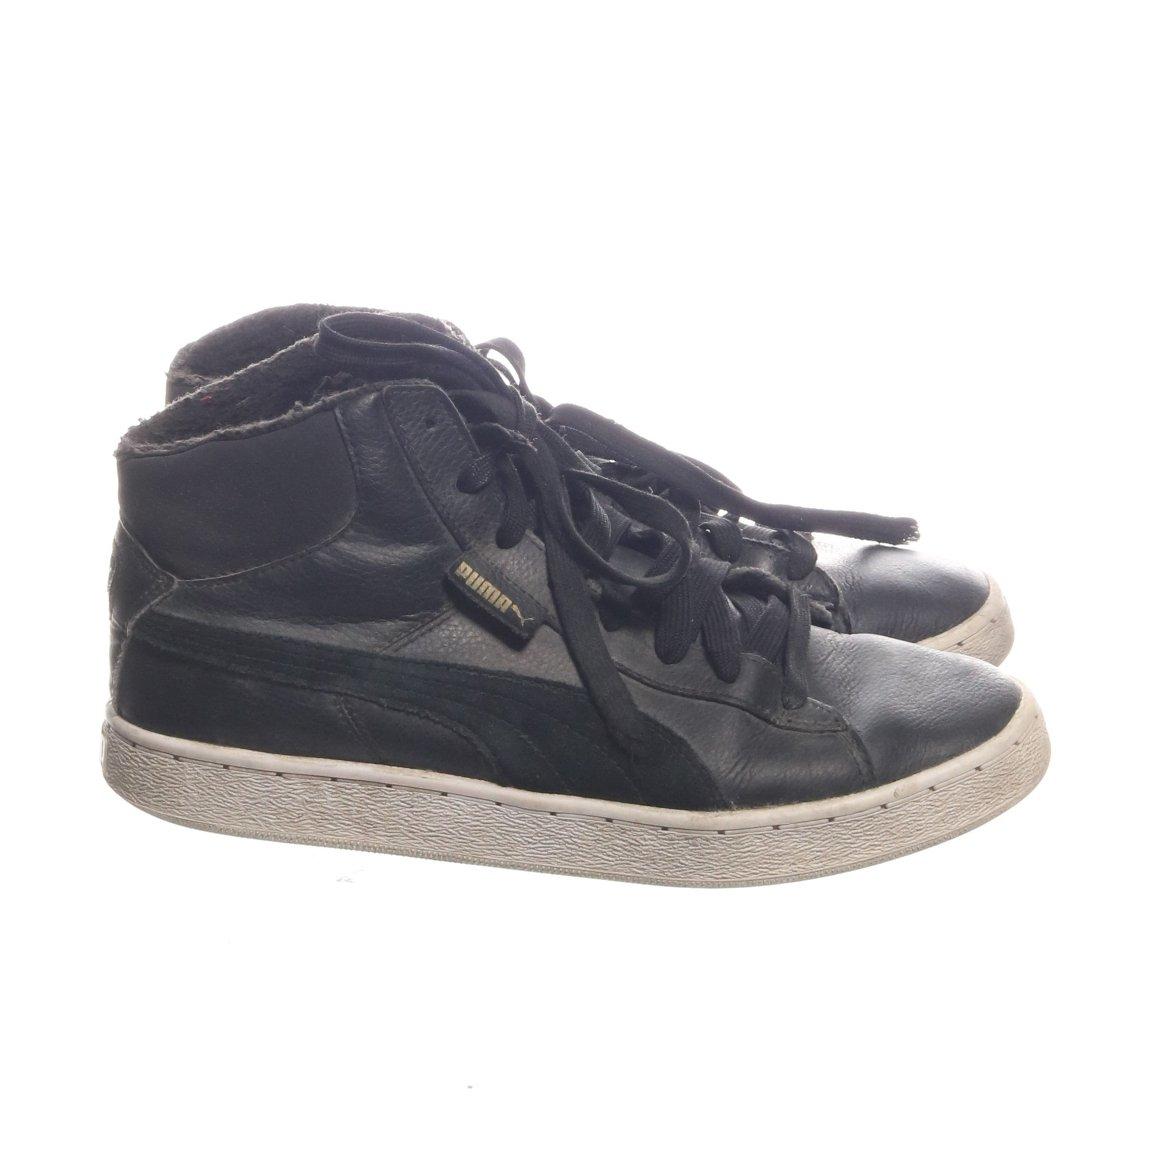 promo code cbfe7 48b96 Puma, Sneakers, Strl  39, Herr barn, Svart, Skinn